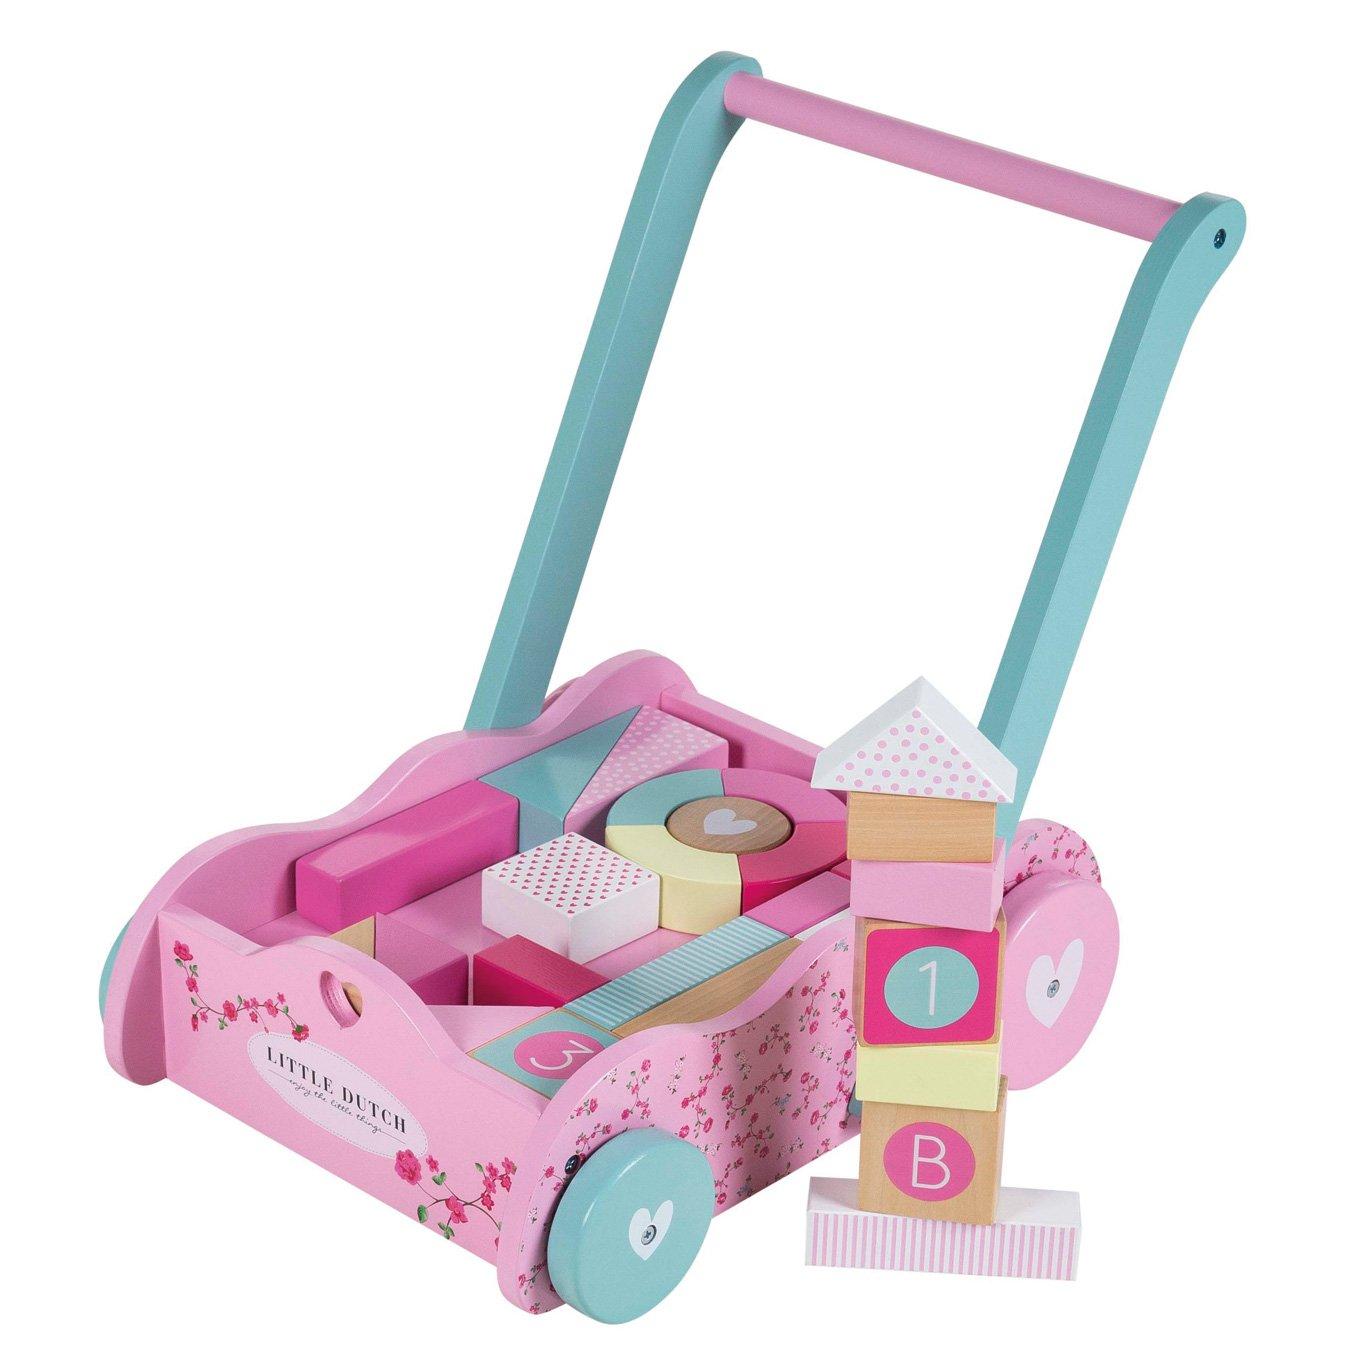 Little Dutch Andador 4352 de construcción con lötzen - Pink ...